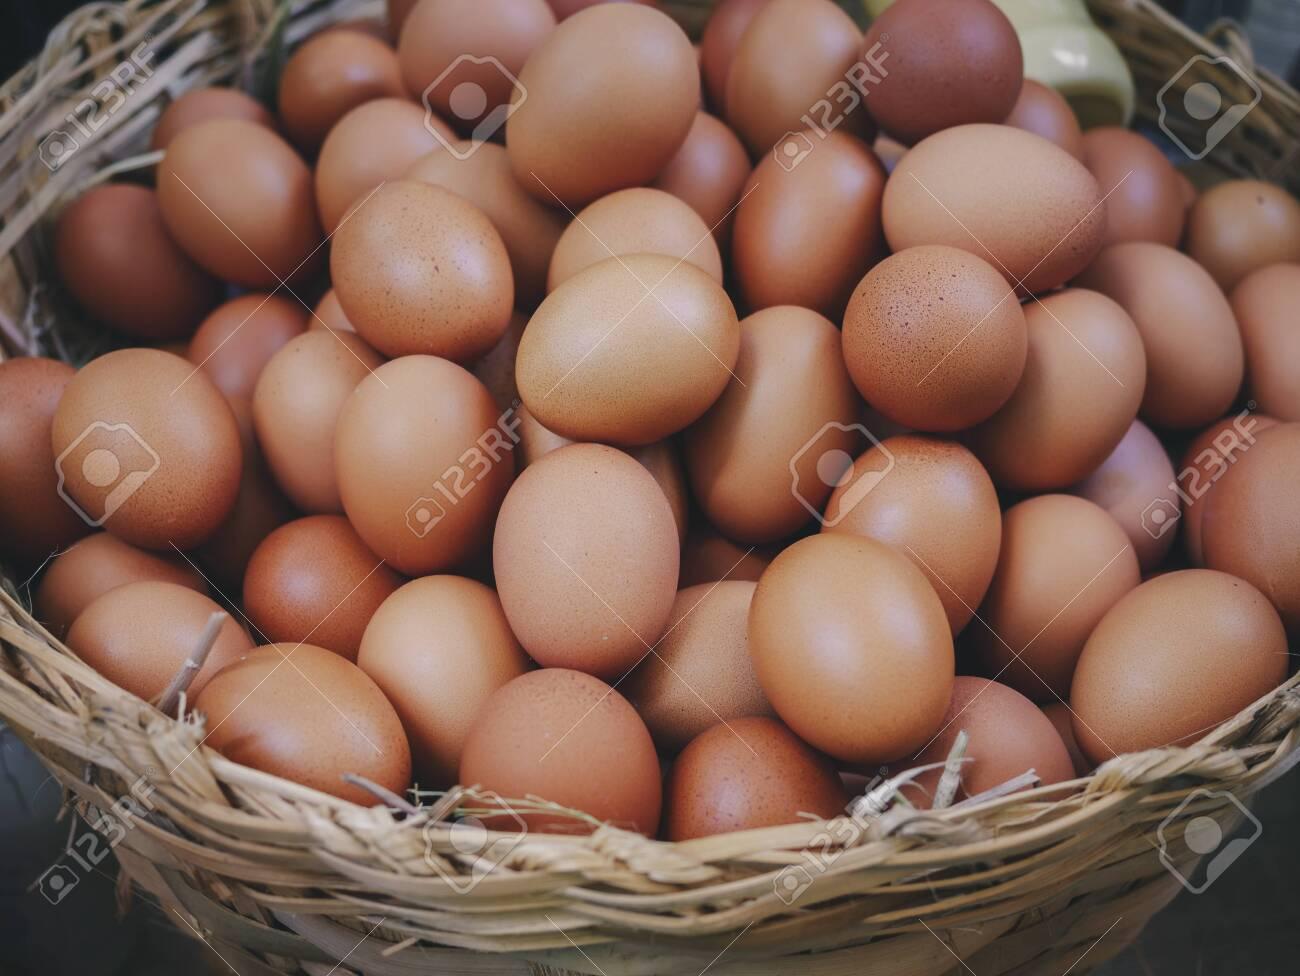 Eggs in basket fresh eggs farm product Organic eggs - 144025573